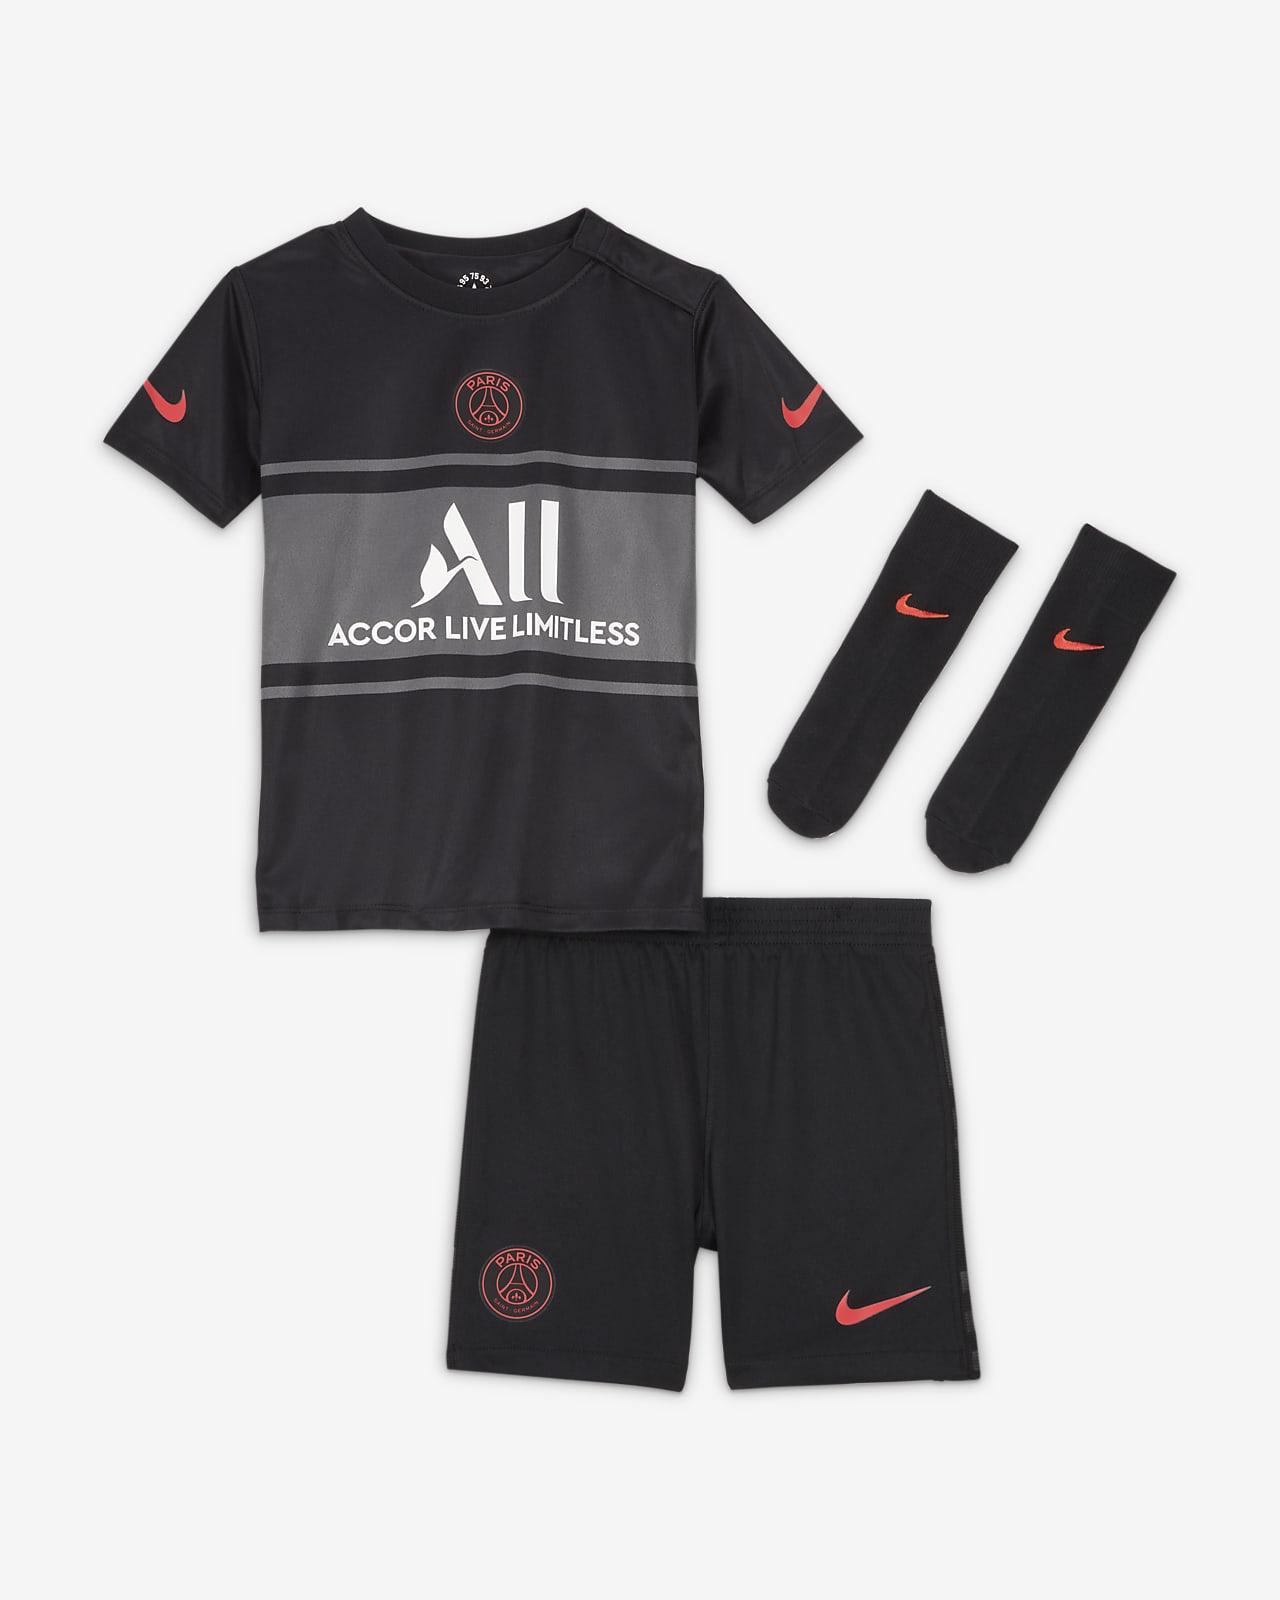 Divisa Paris Saint-Germain 2021/22 per neonati/bimbi piccoli - Terza